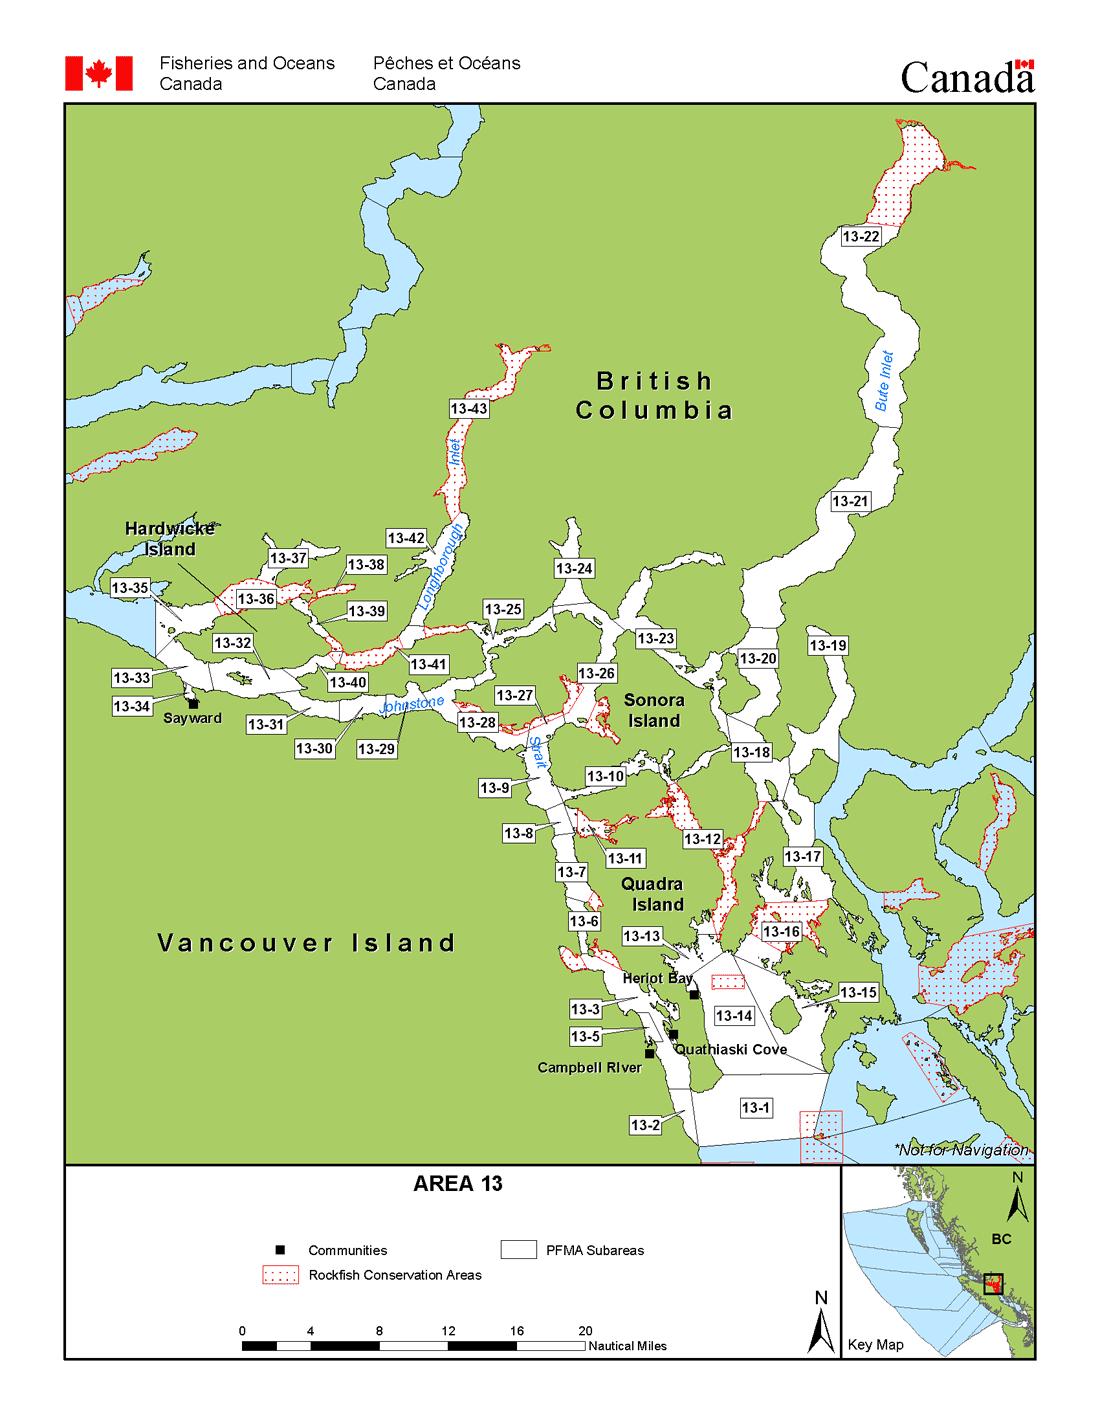 Area 13 Campbell River and Cortes Sonora Quadra Islands BC